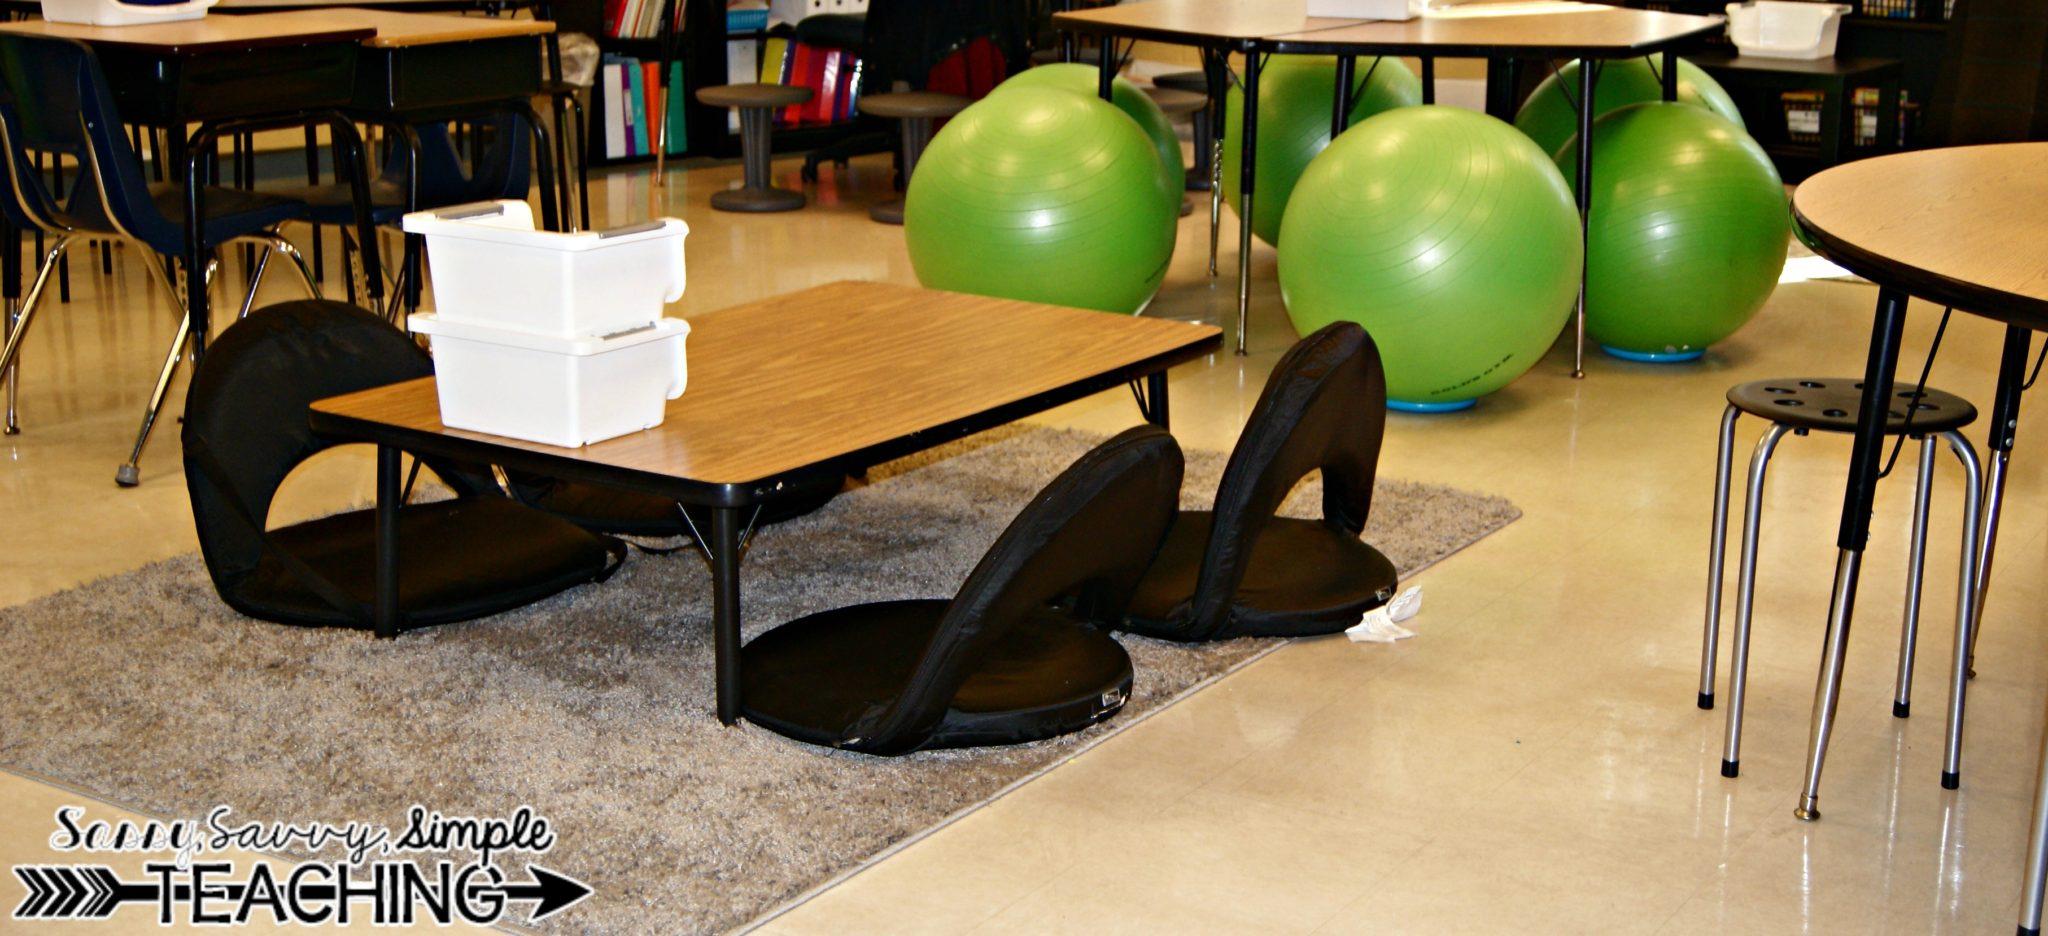 Flexible Seating Classroom Sassy Savvy Simple Teaching